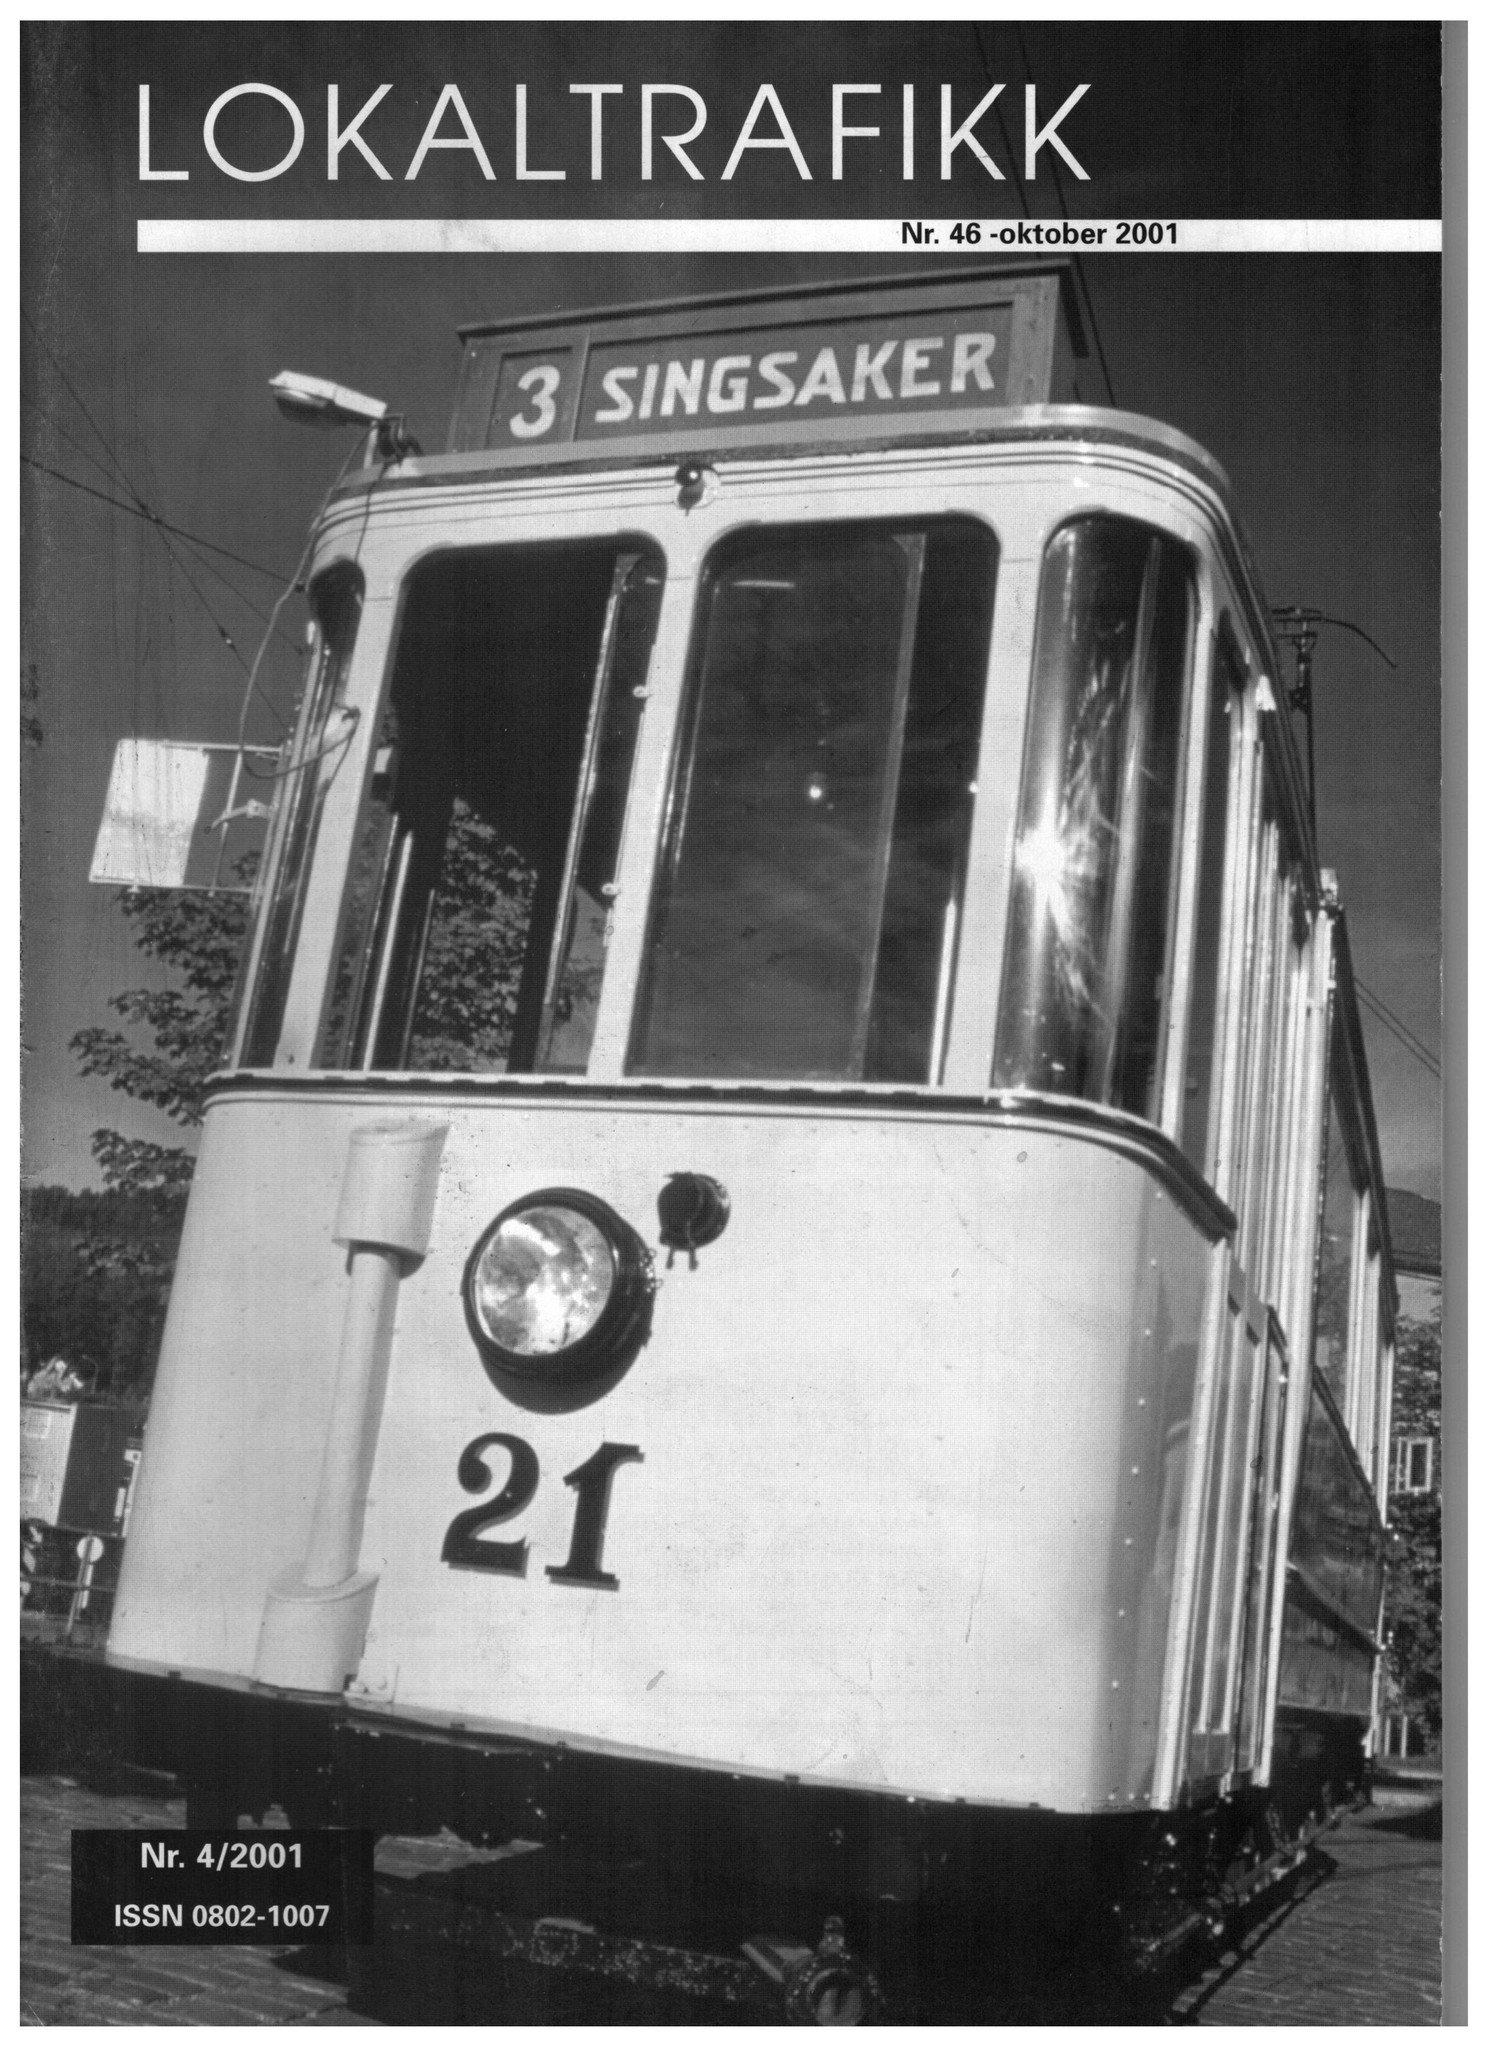 Lokaltrafikk #046